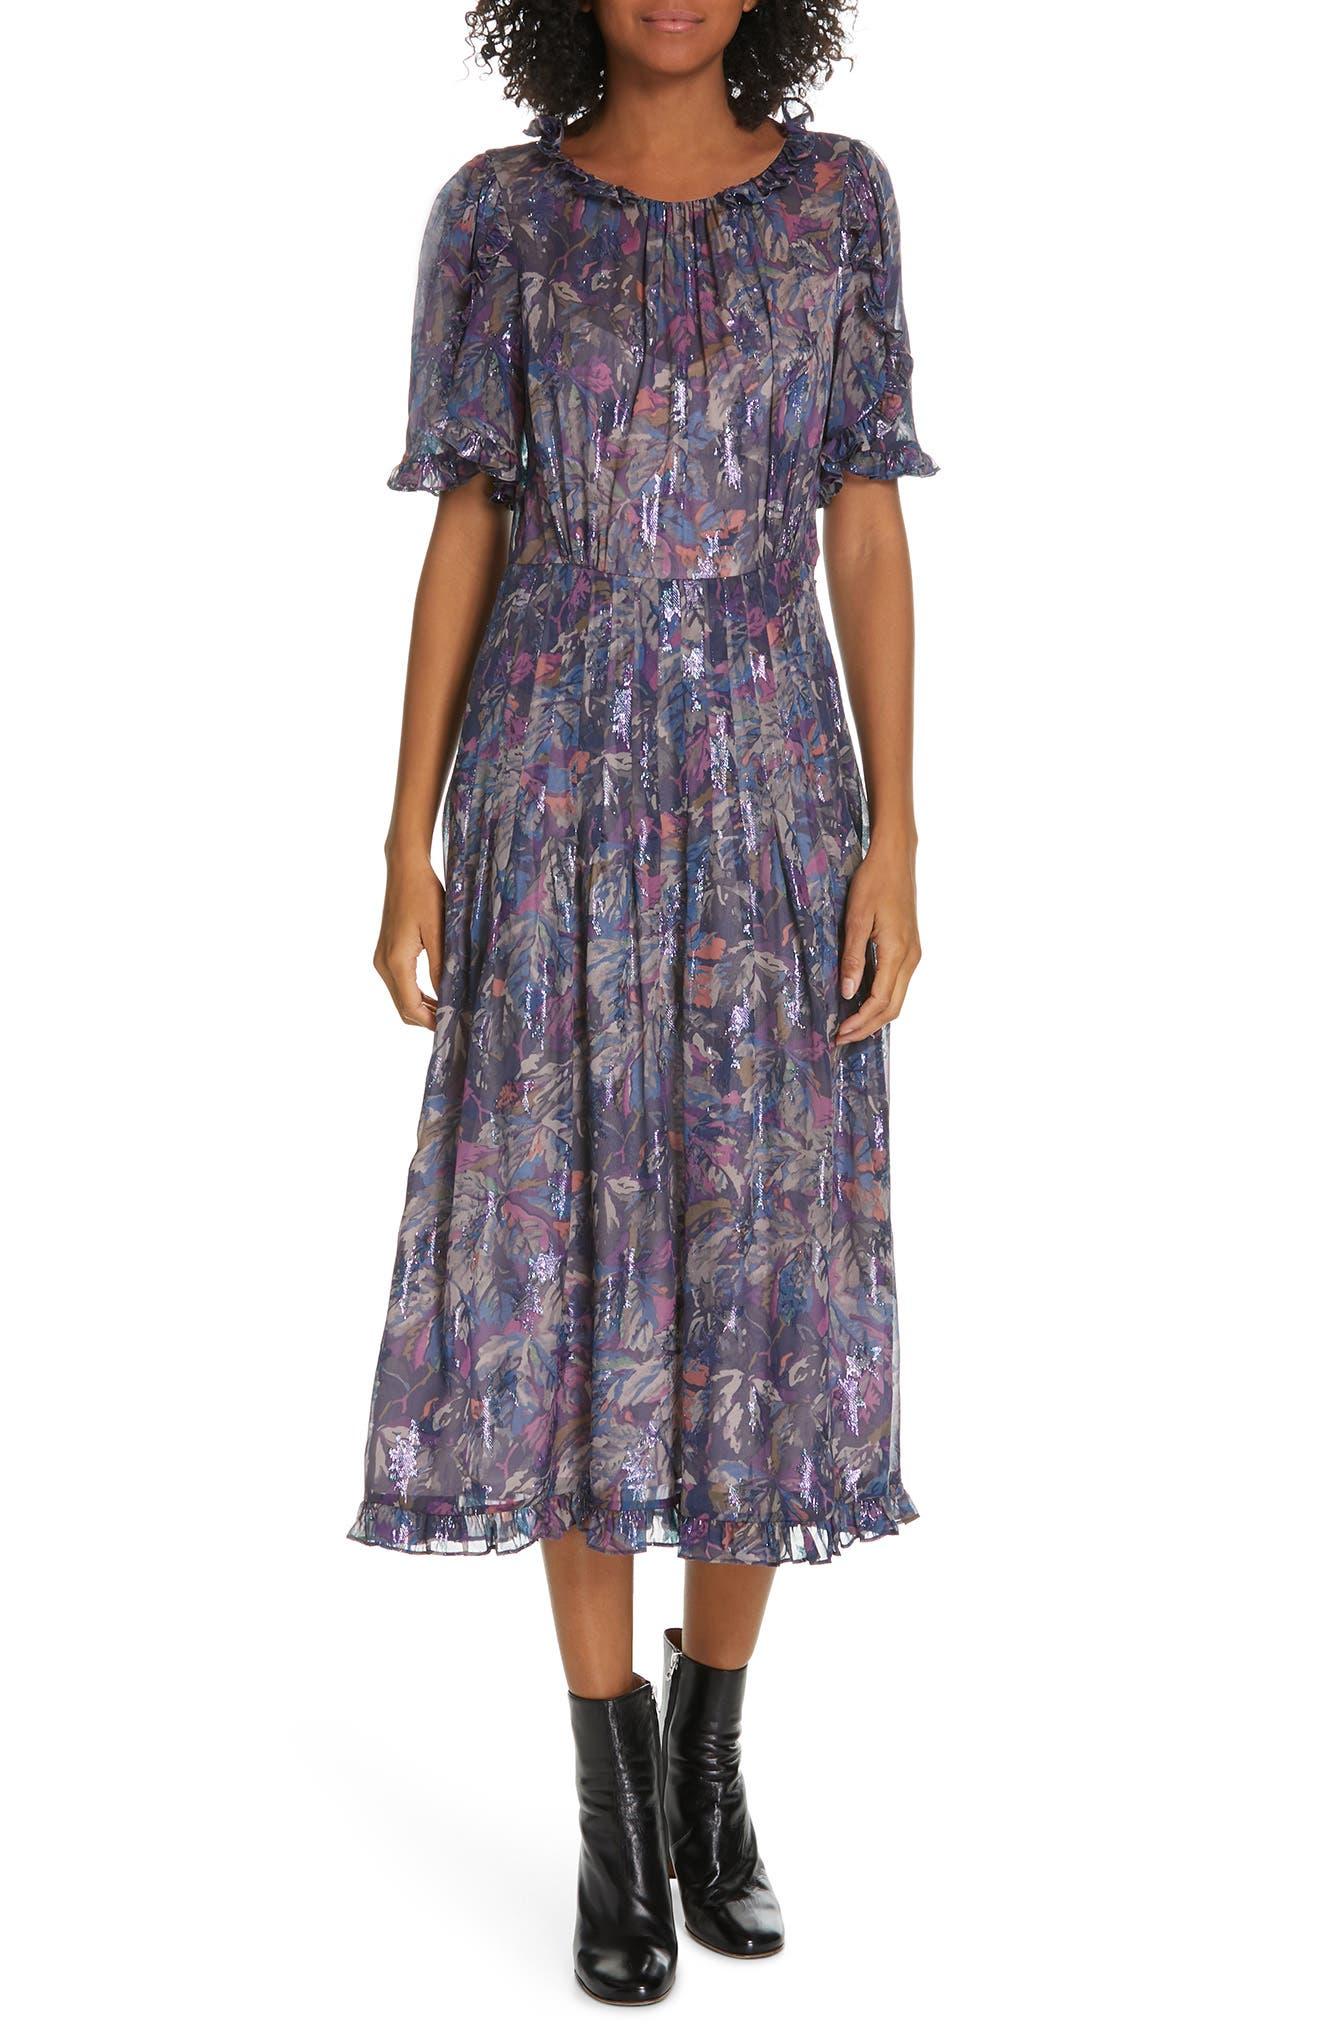 Giverny Metallic Detail Silk Chiffon Dress,                             Main thumbnail 1, color,                             AMETHYST COMBO